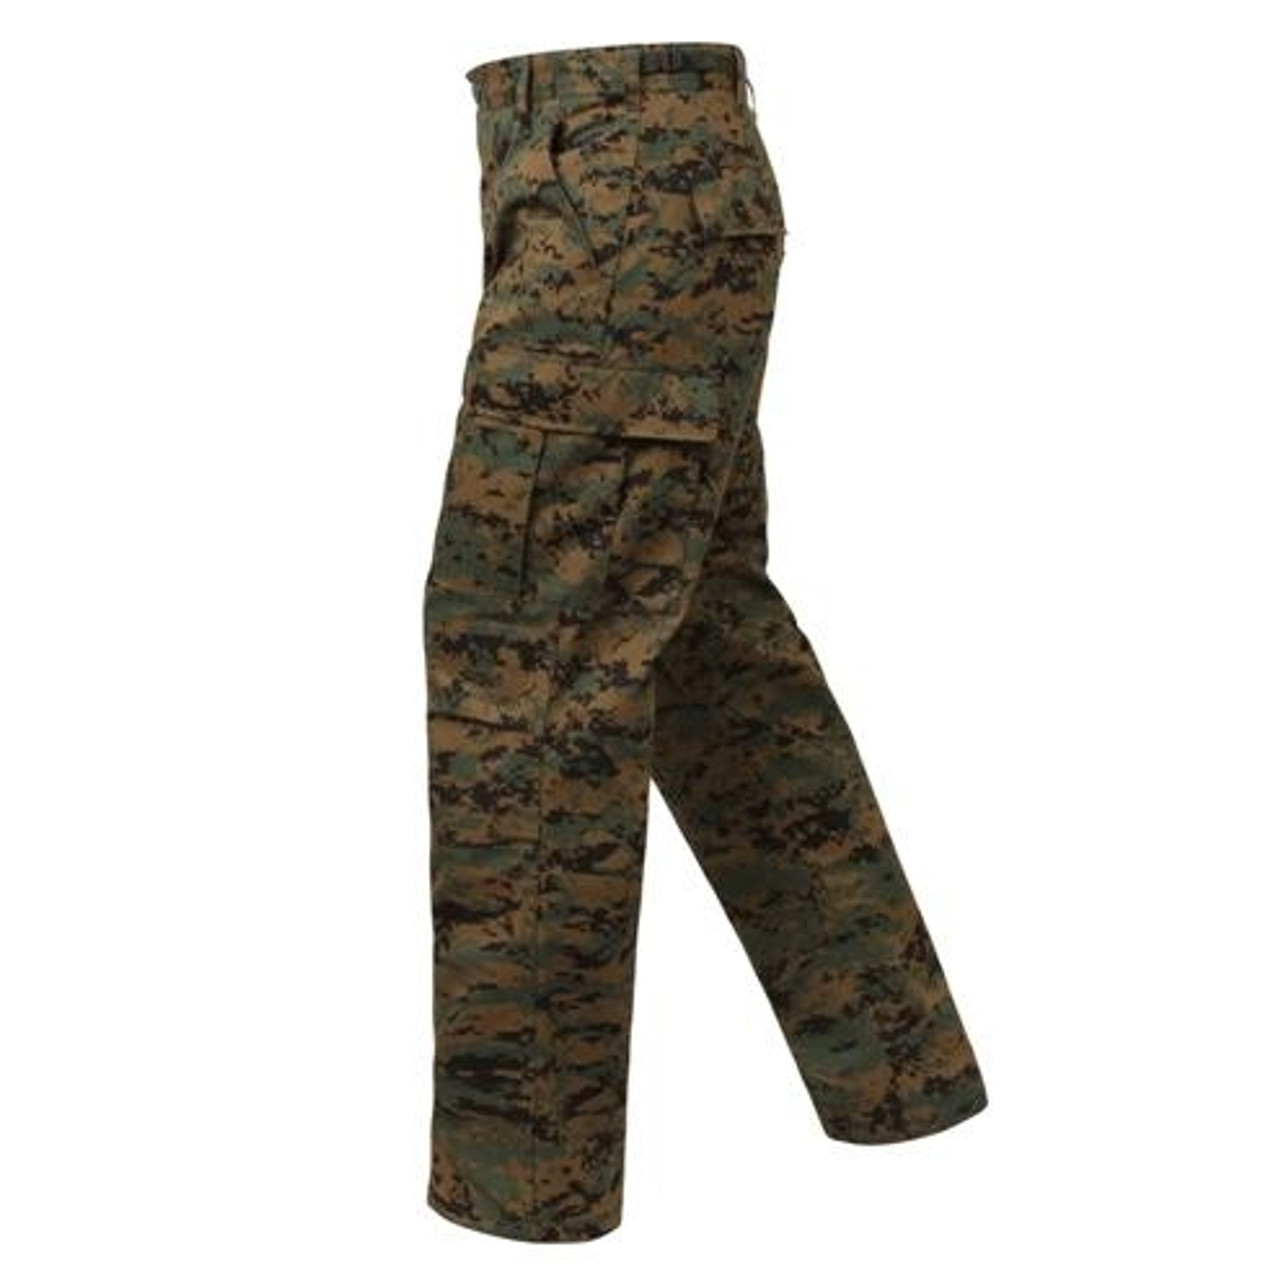 Camo BDU Pants - Woodland Digital from Hessen Tactical